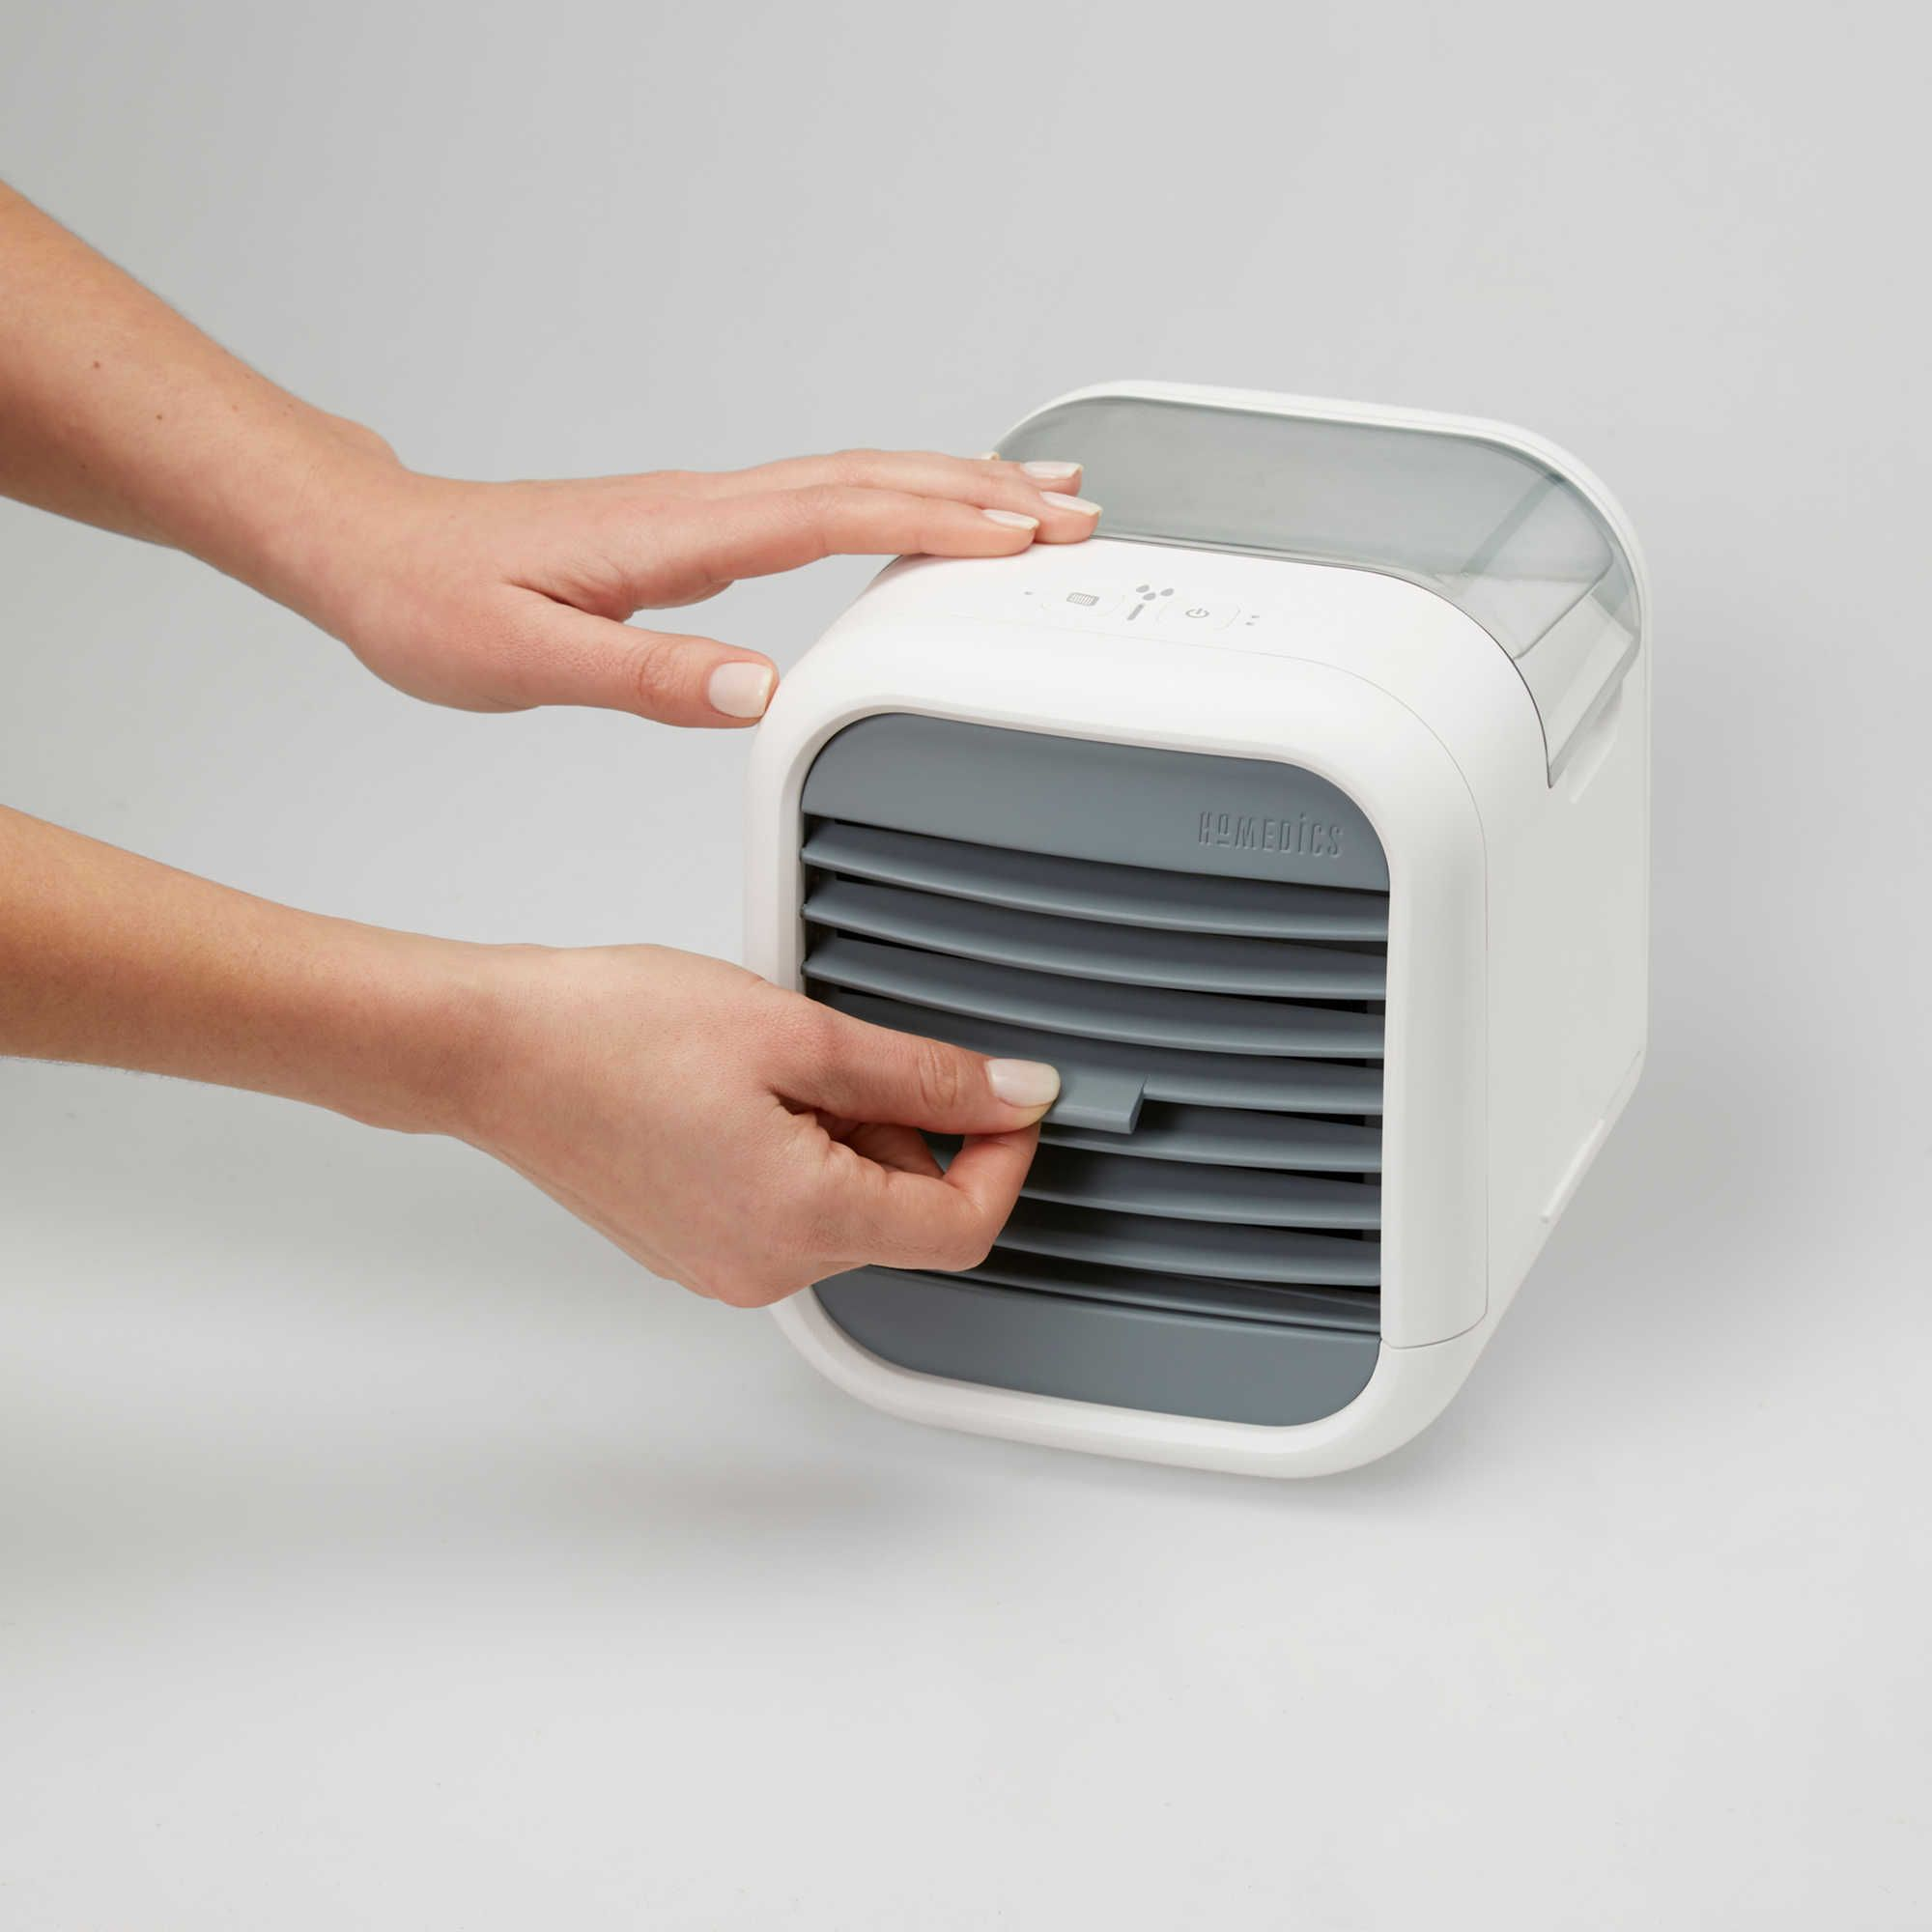 HoMedics® MyChill Medium Personal Space Cooler Plus in